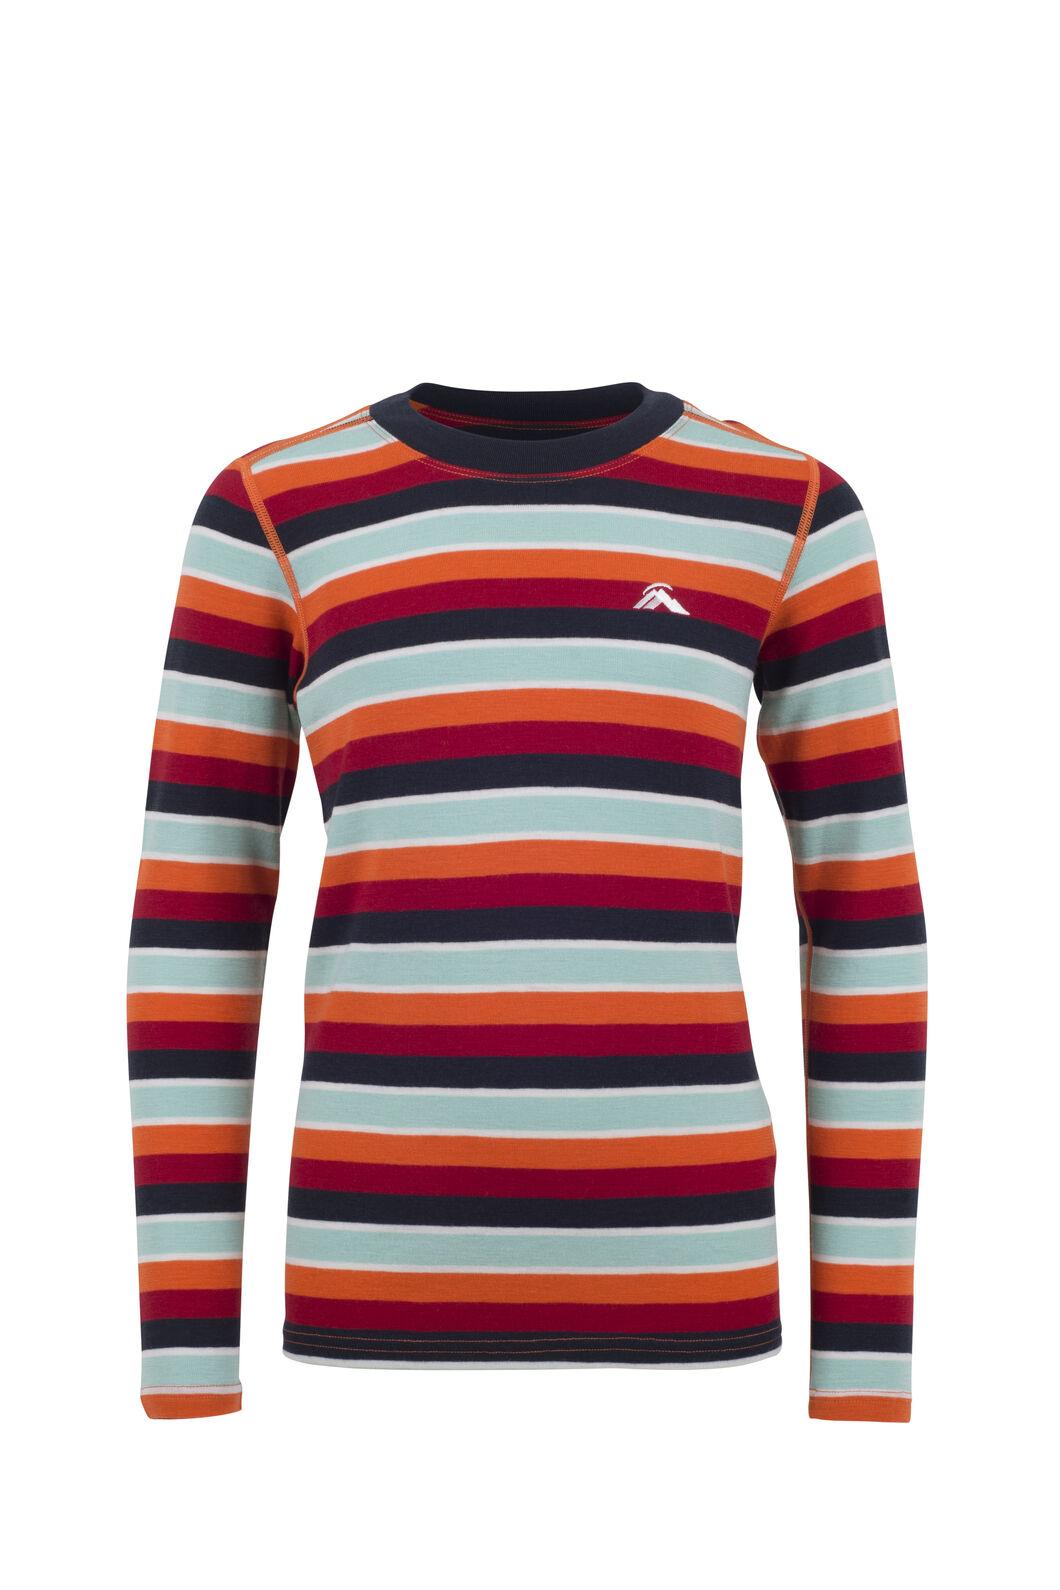 Macpac 220 Merino Long Sleeve Top - Kids', Orange Stripe, hi-res